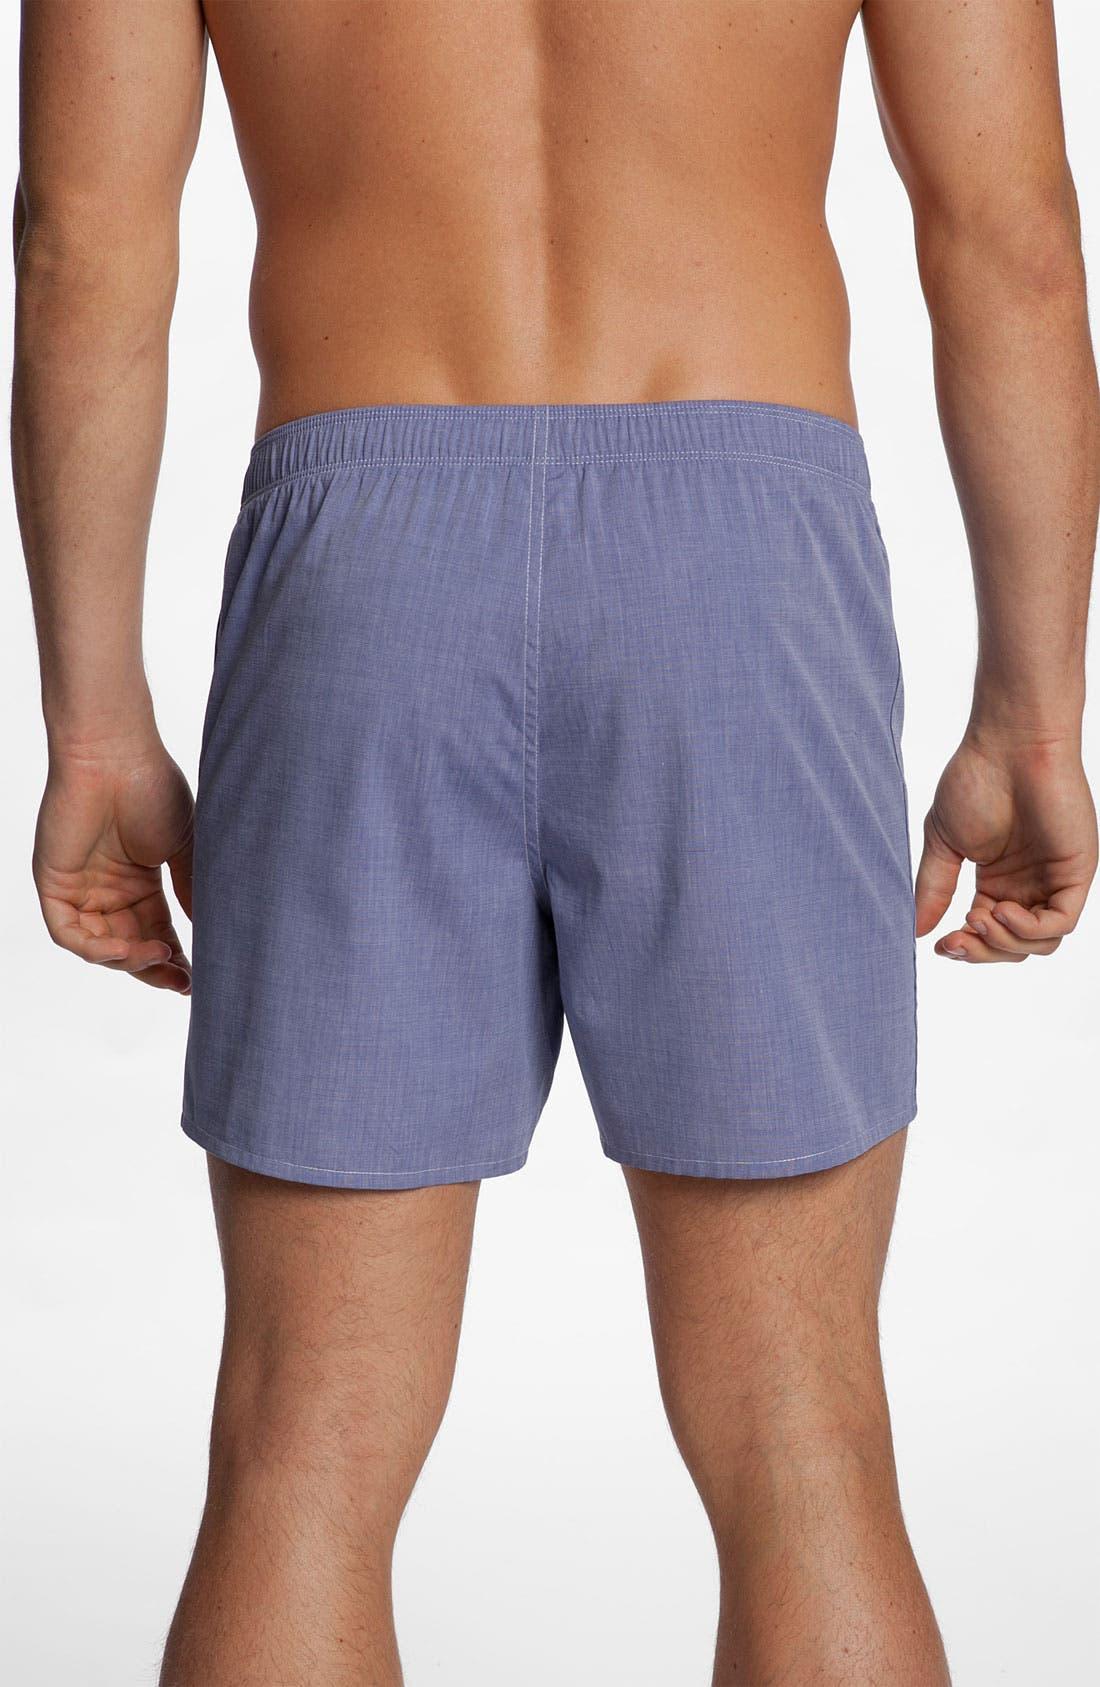 Alternate Image 2  - Nordstrom Trim Fit Cotton Boxers